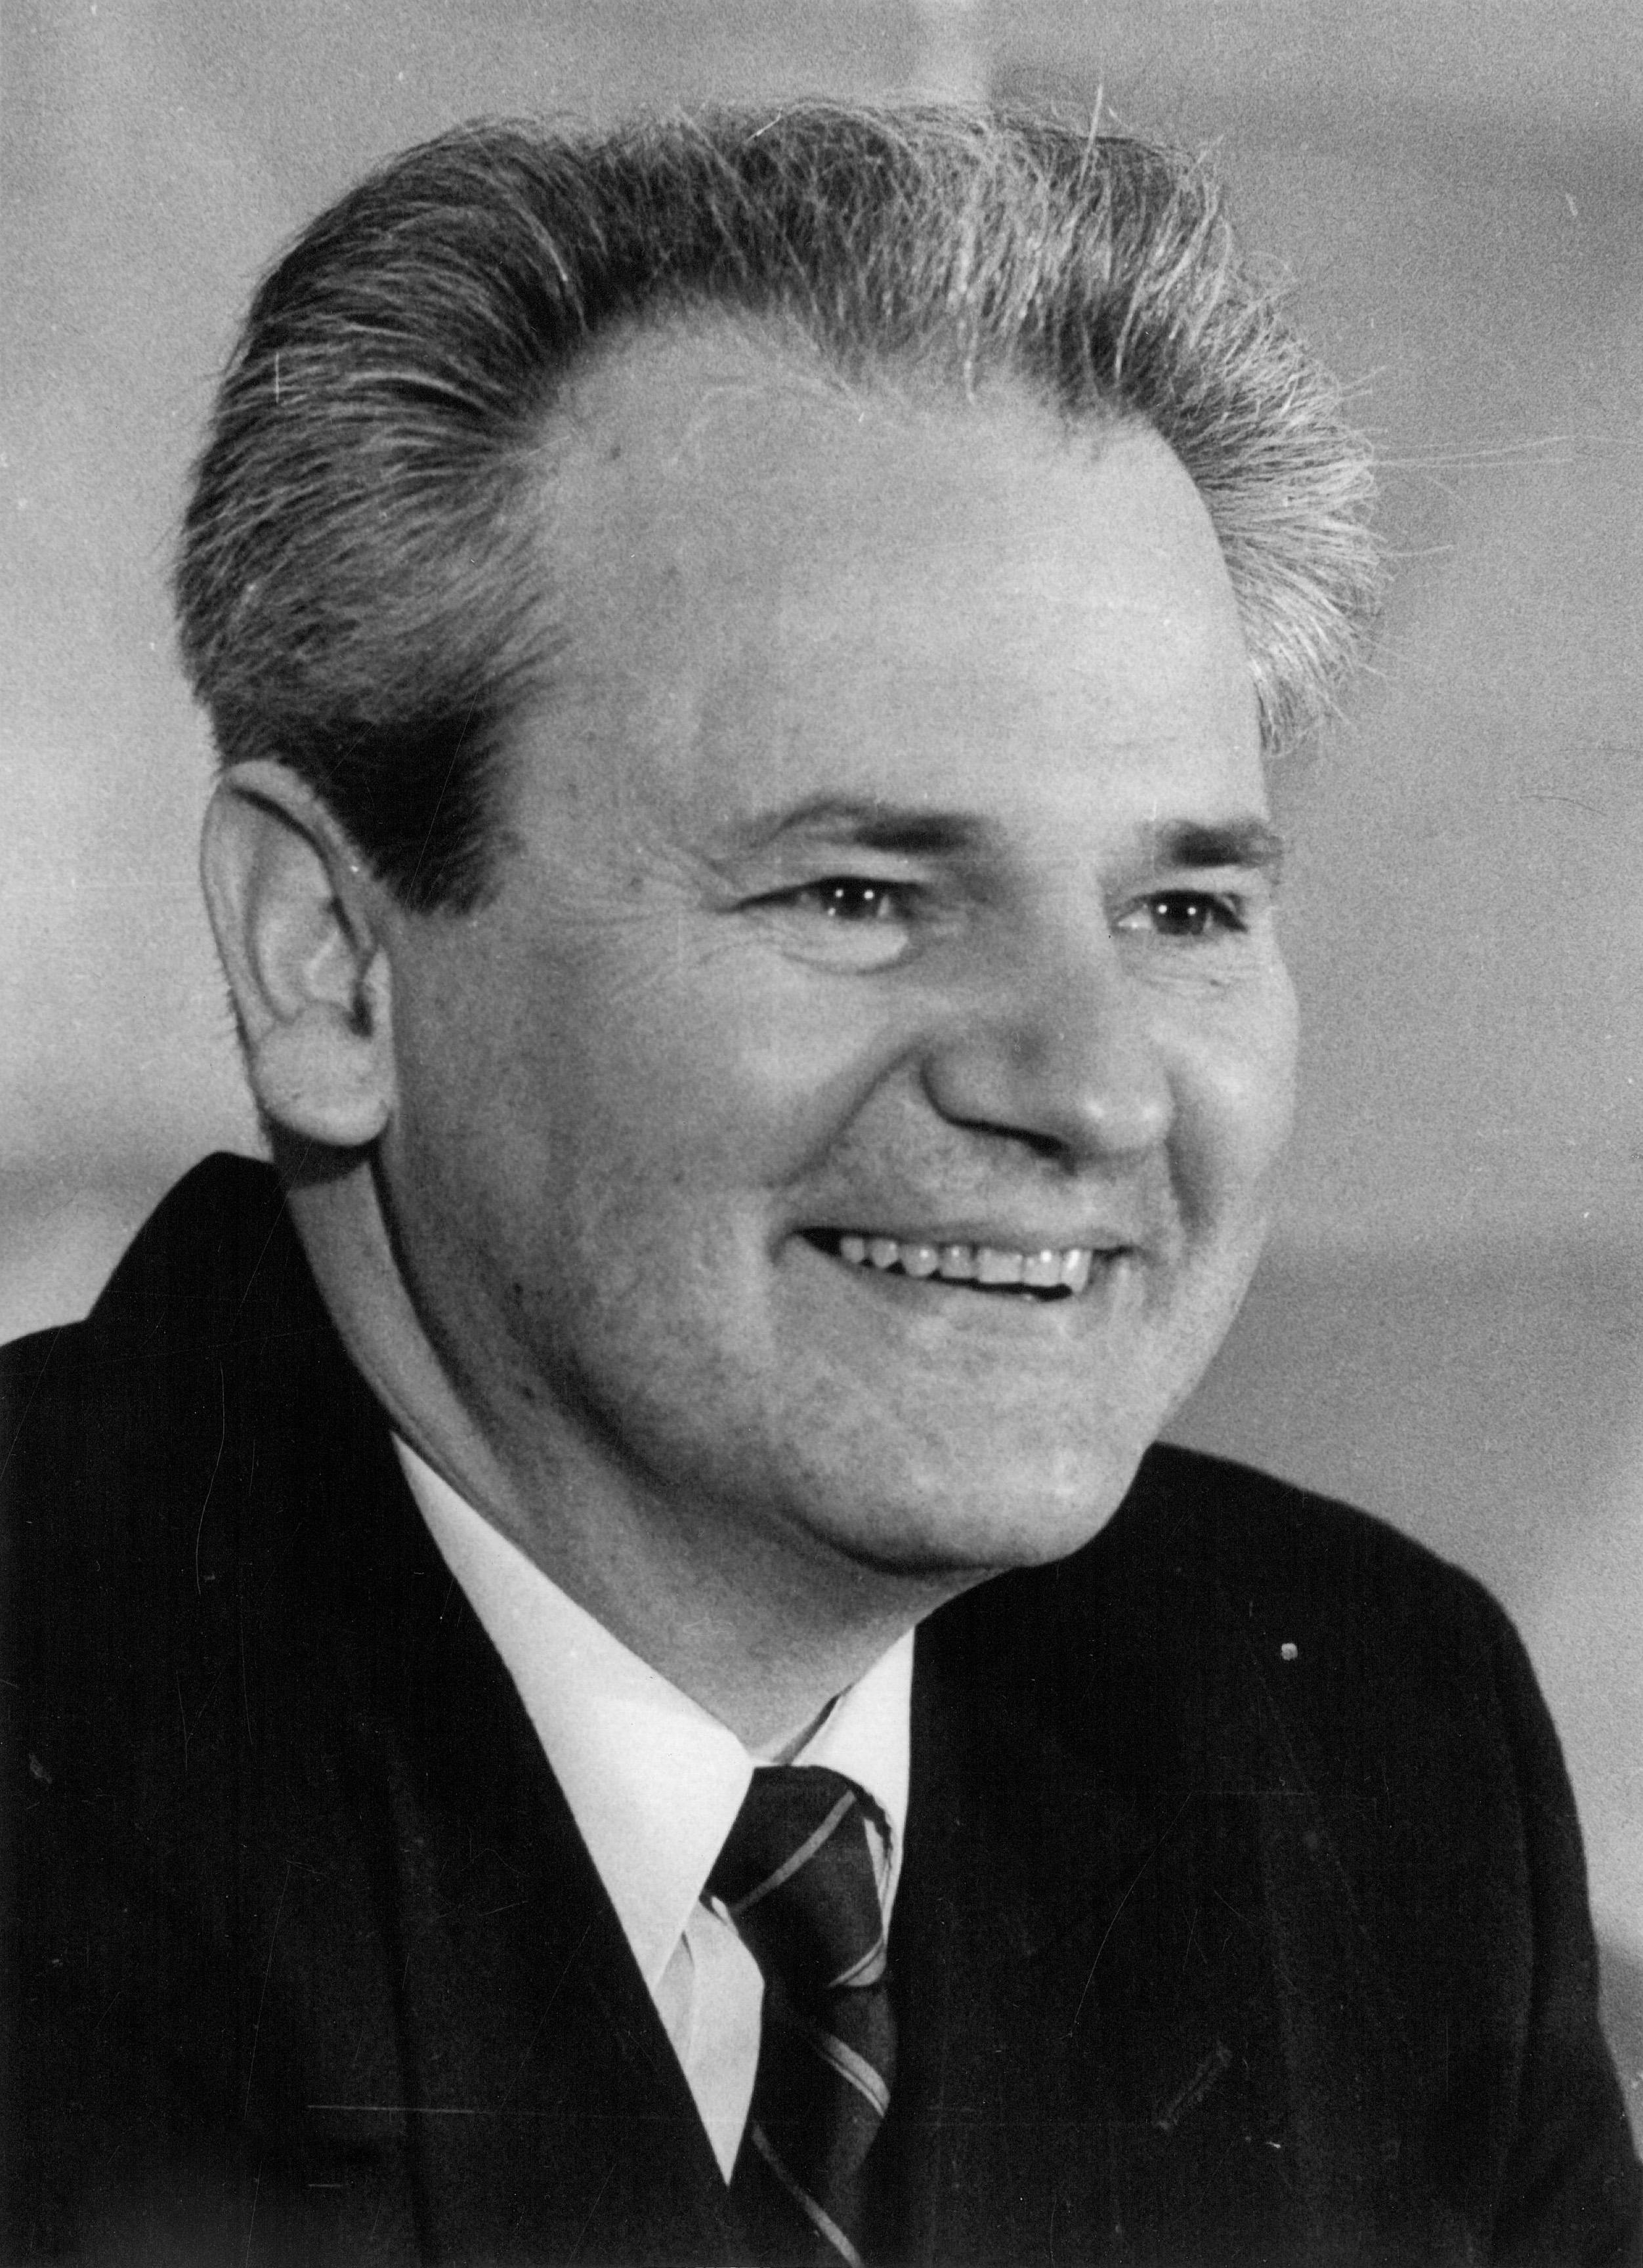 Stevan Kragujevic, Slobodan Milosevic, portret.jpg